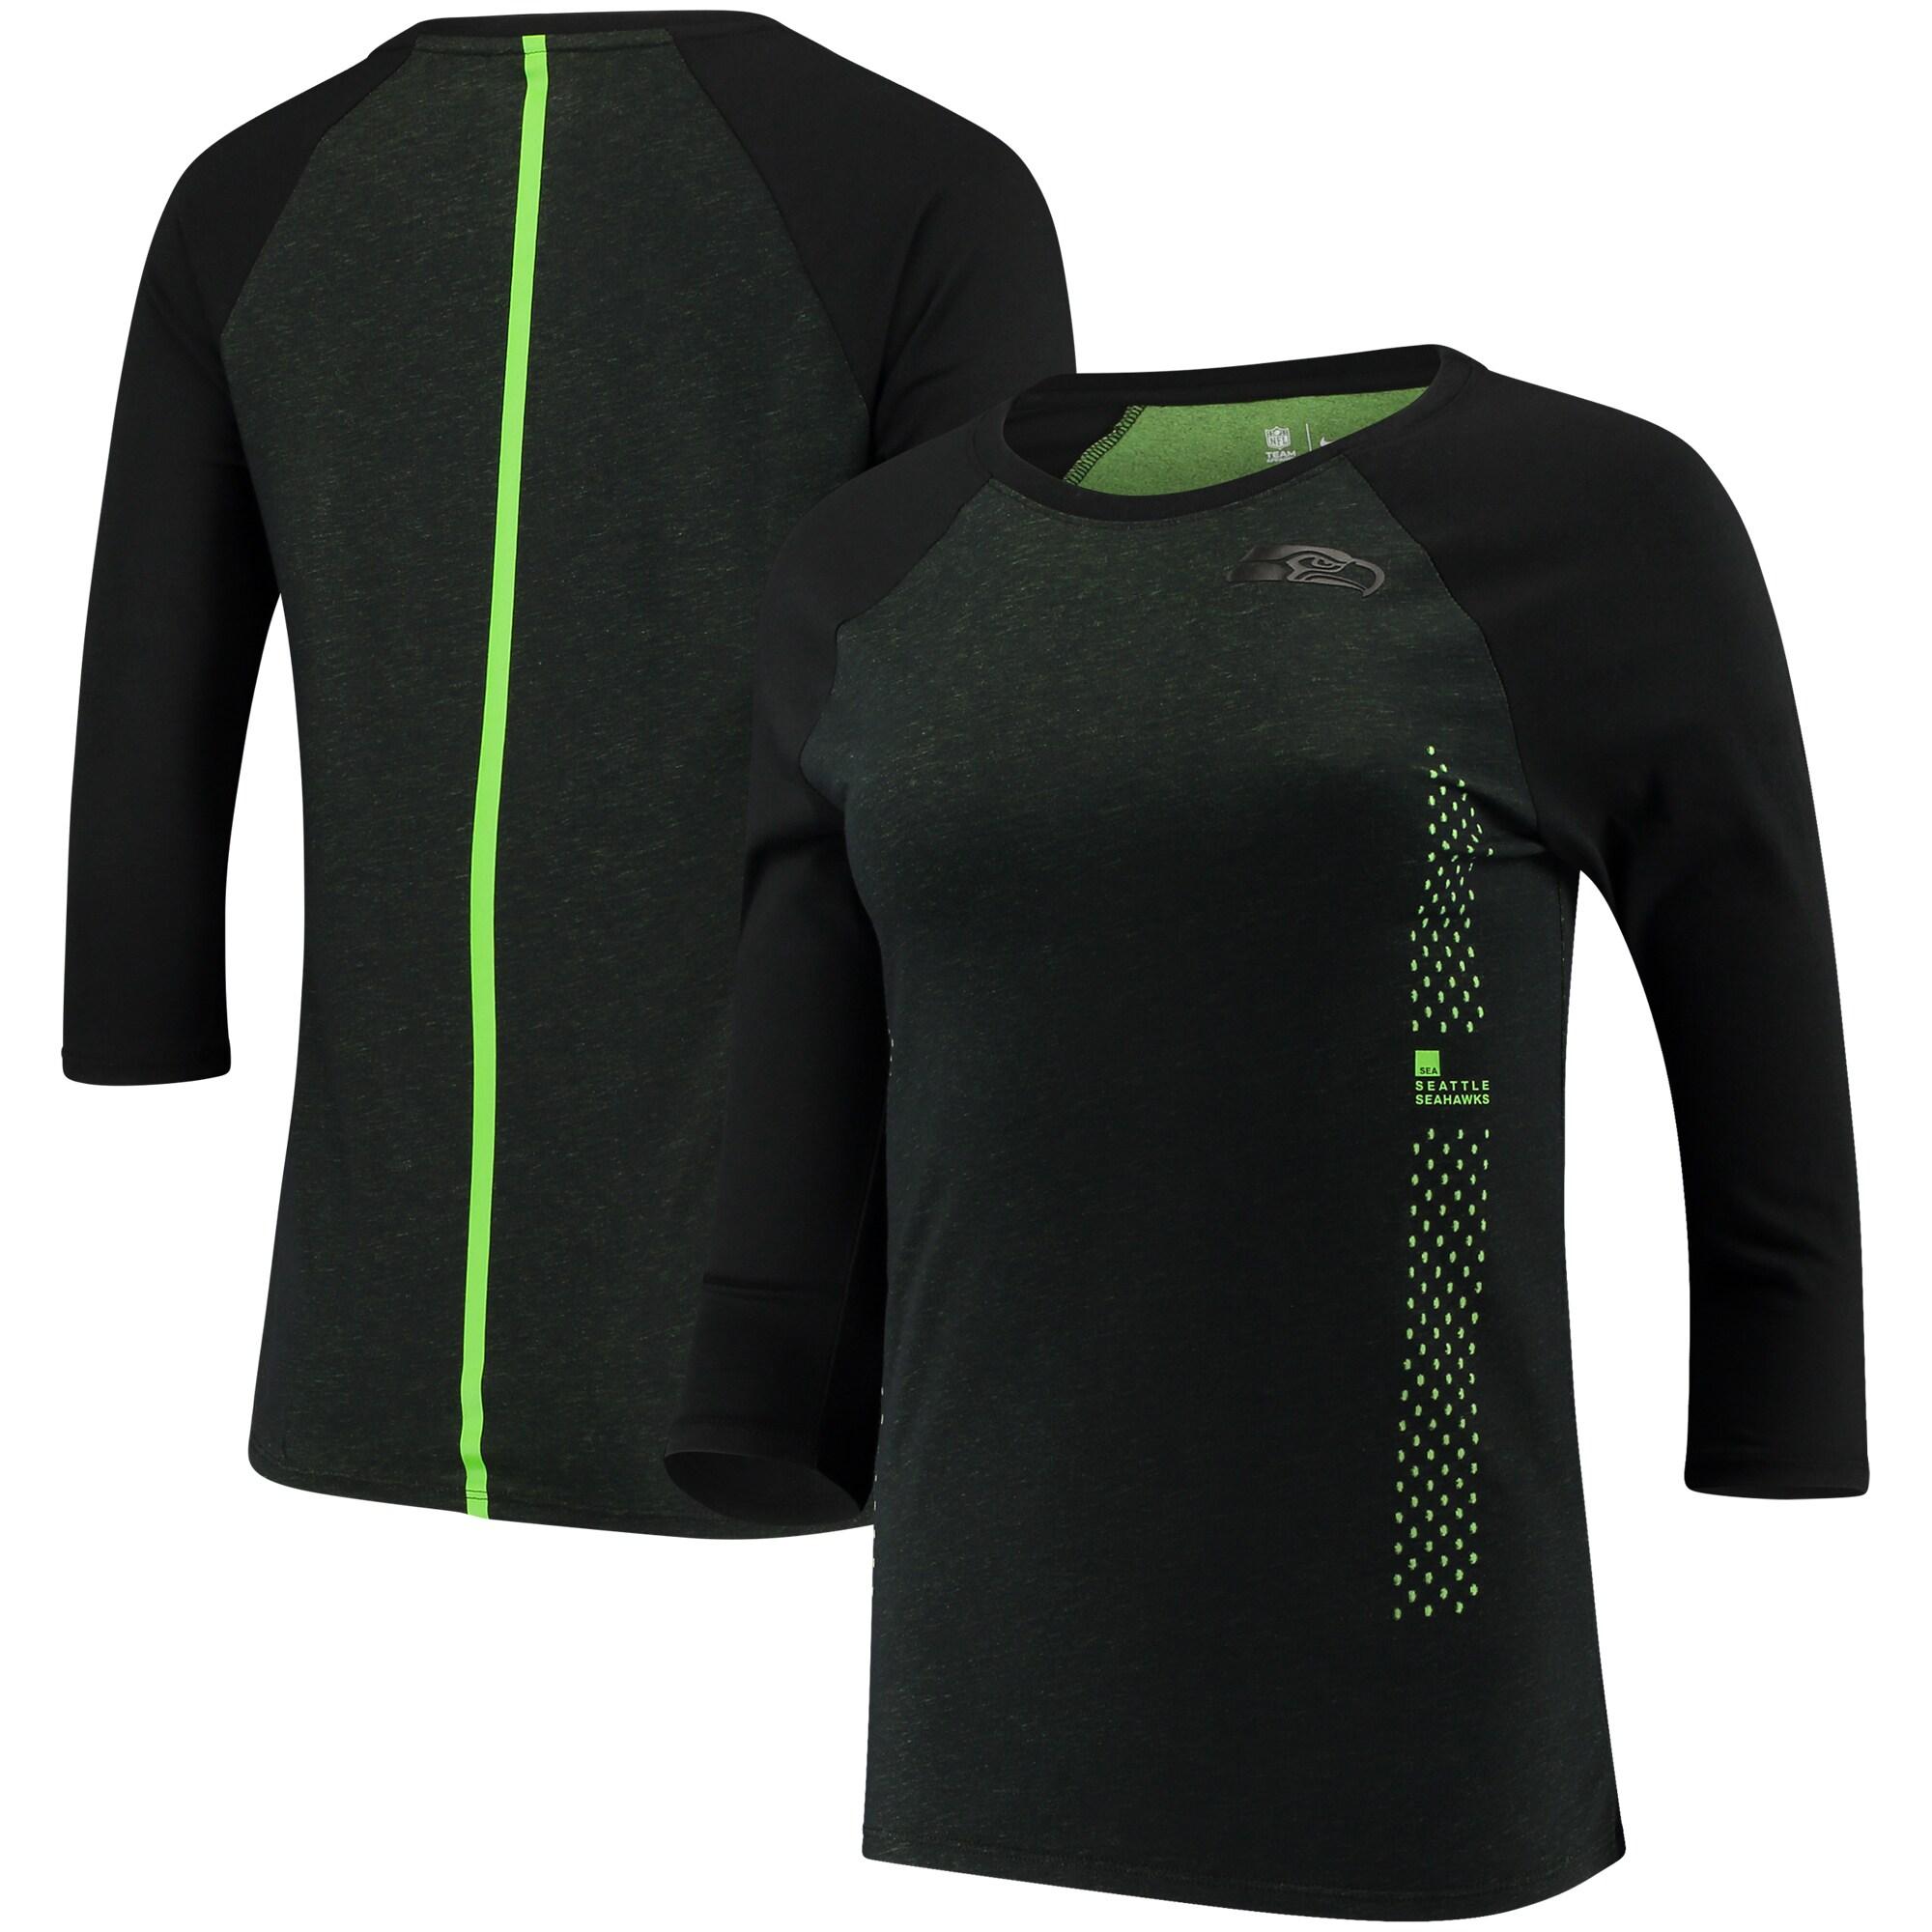 Seattle Seahawks Nike Women's Performance Black Pack 3/4 Sleeve Raglan T-Shirt - Black